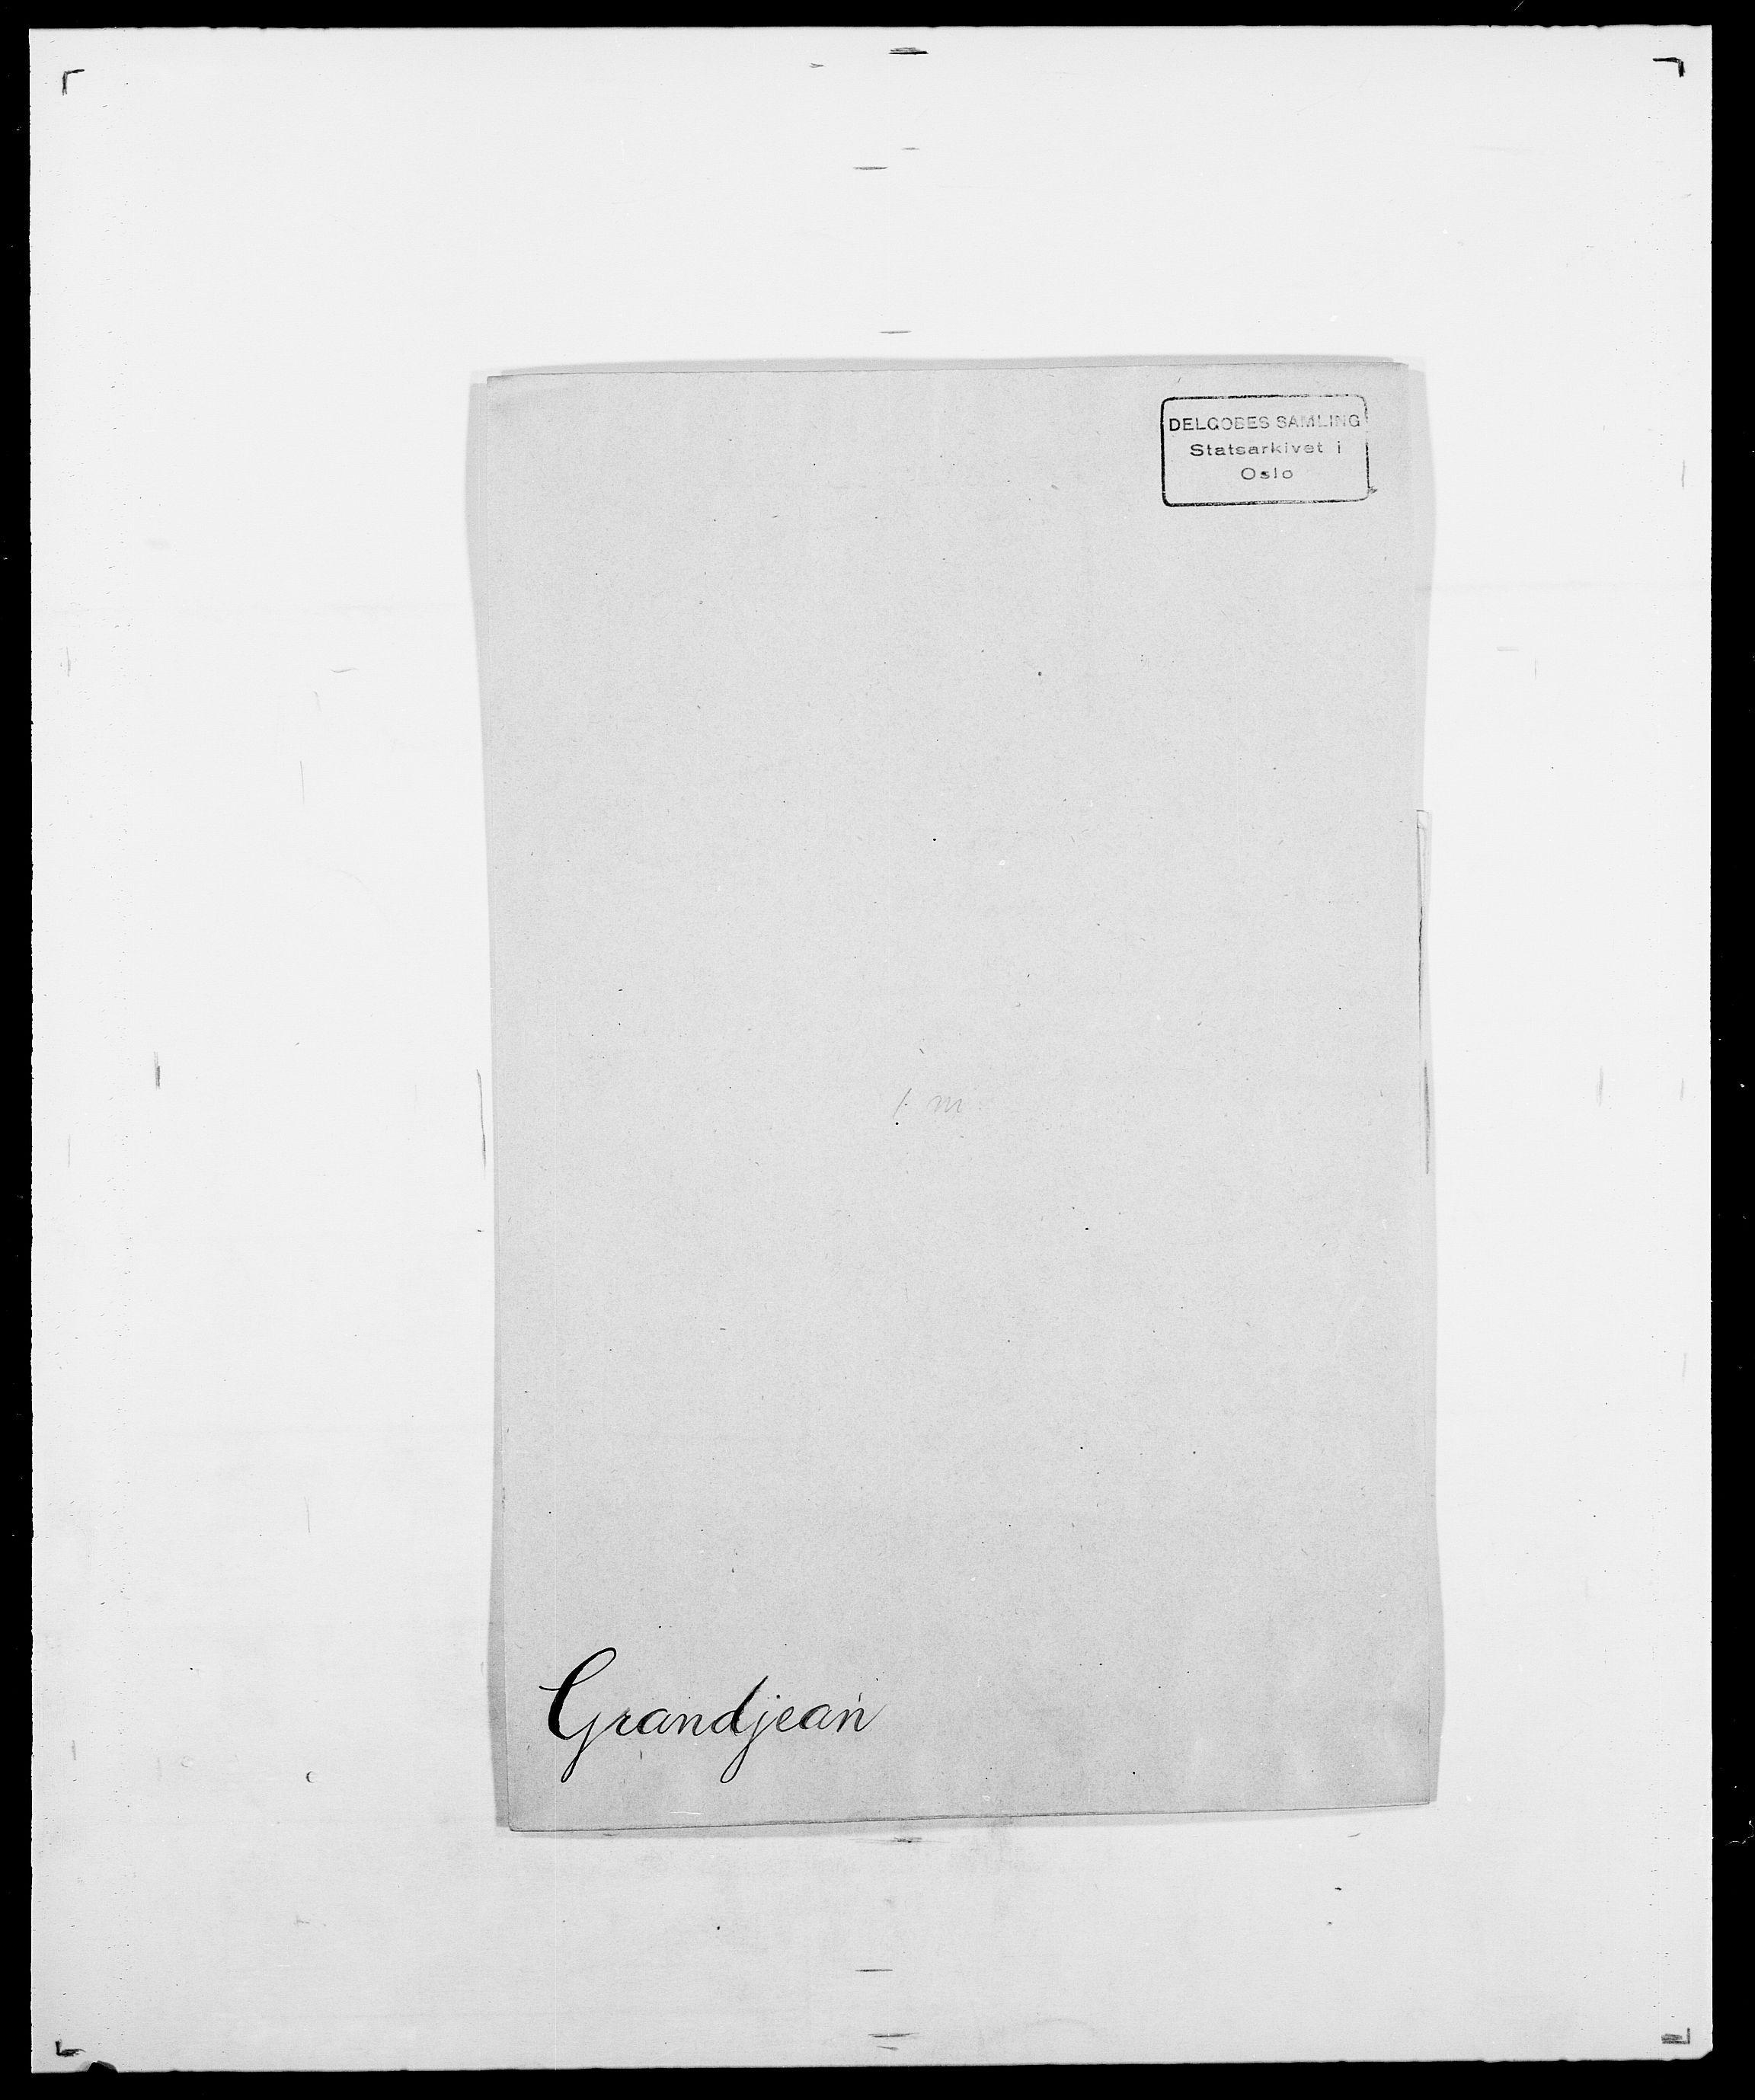 SAO, Delgobe, Charles Antoine - samling, D/Da/L0014: Giebdhausen - Grip, s. 544